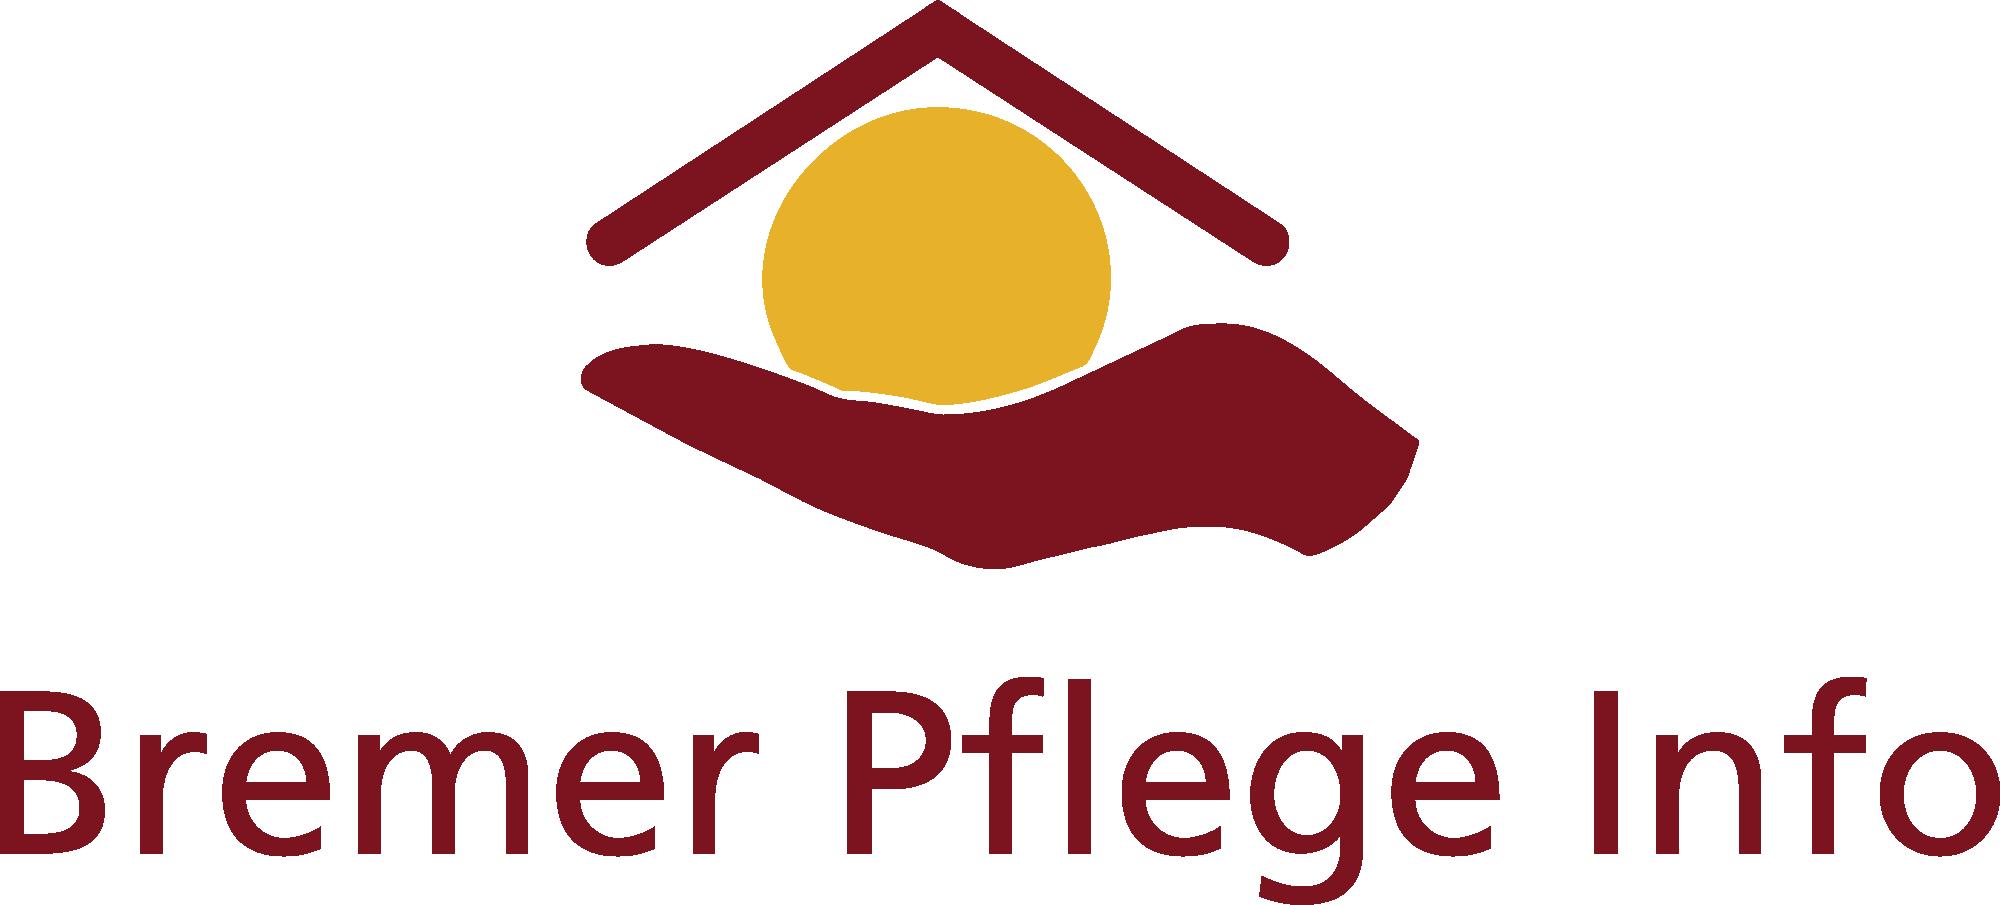 Bremer Pflege Info